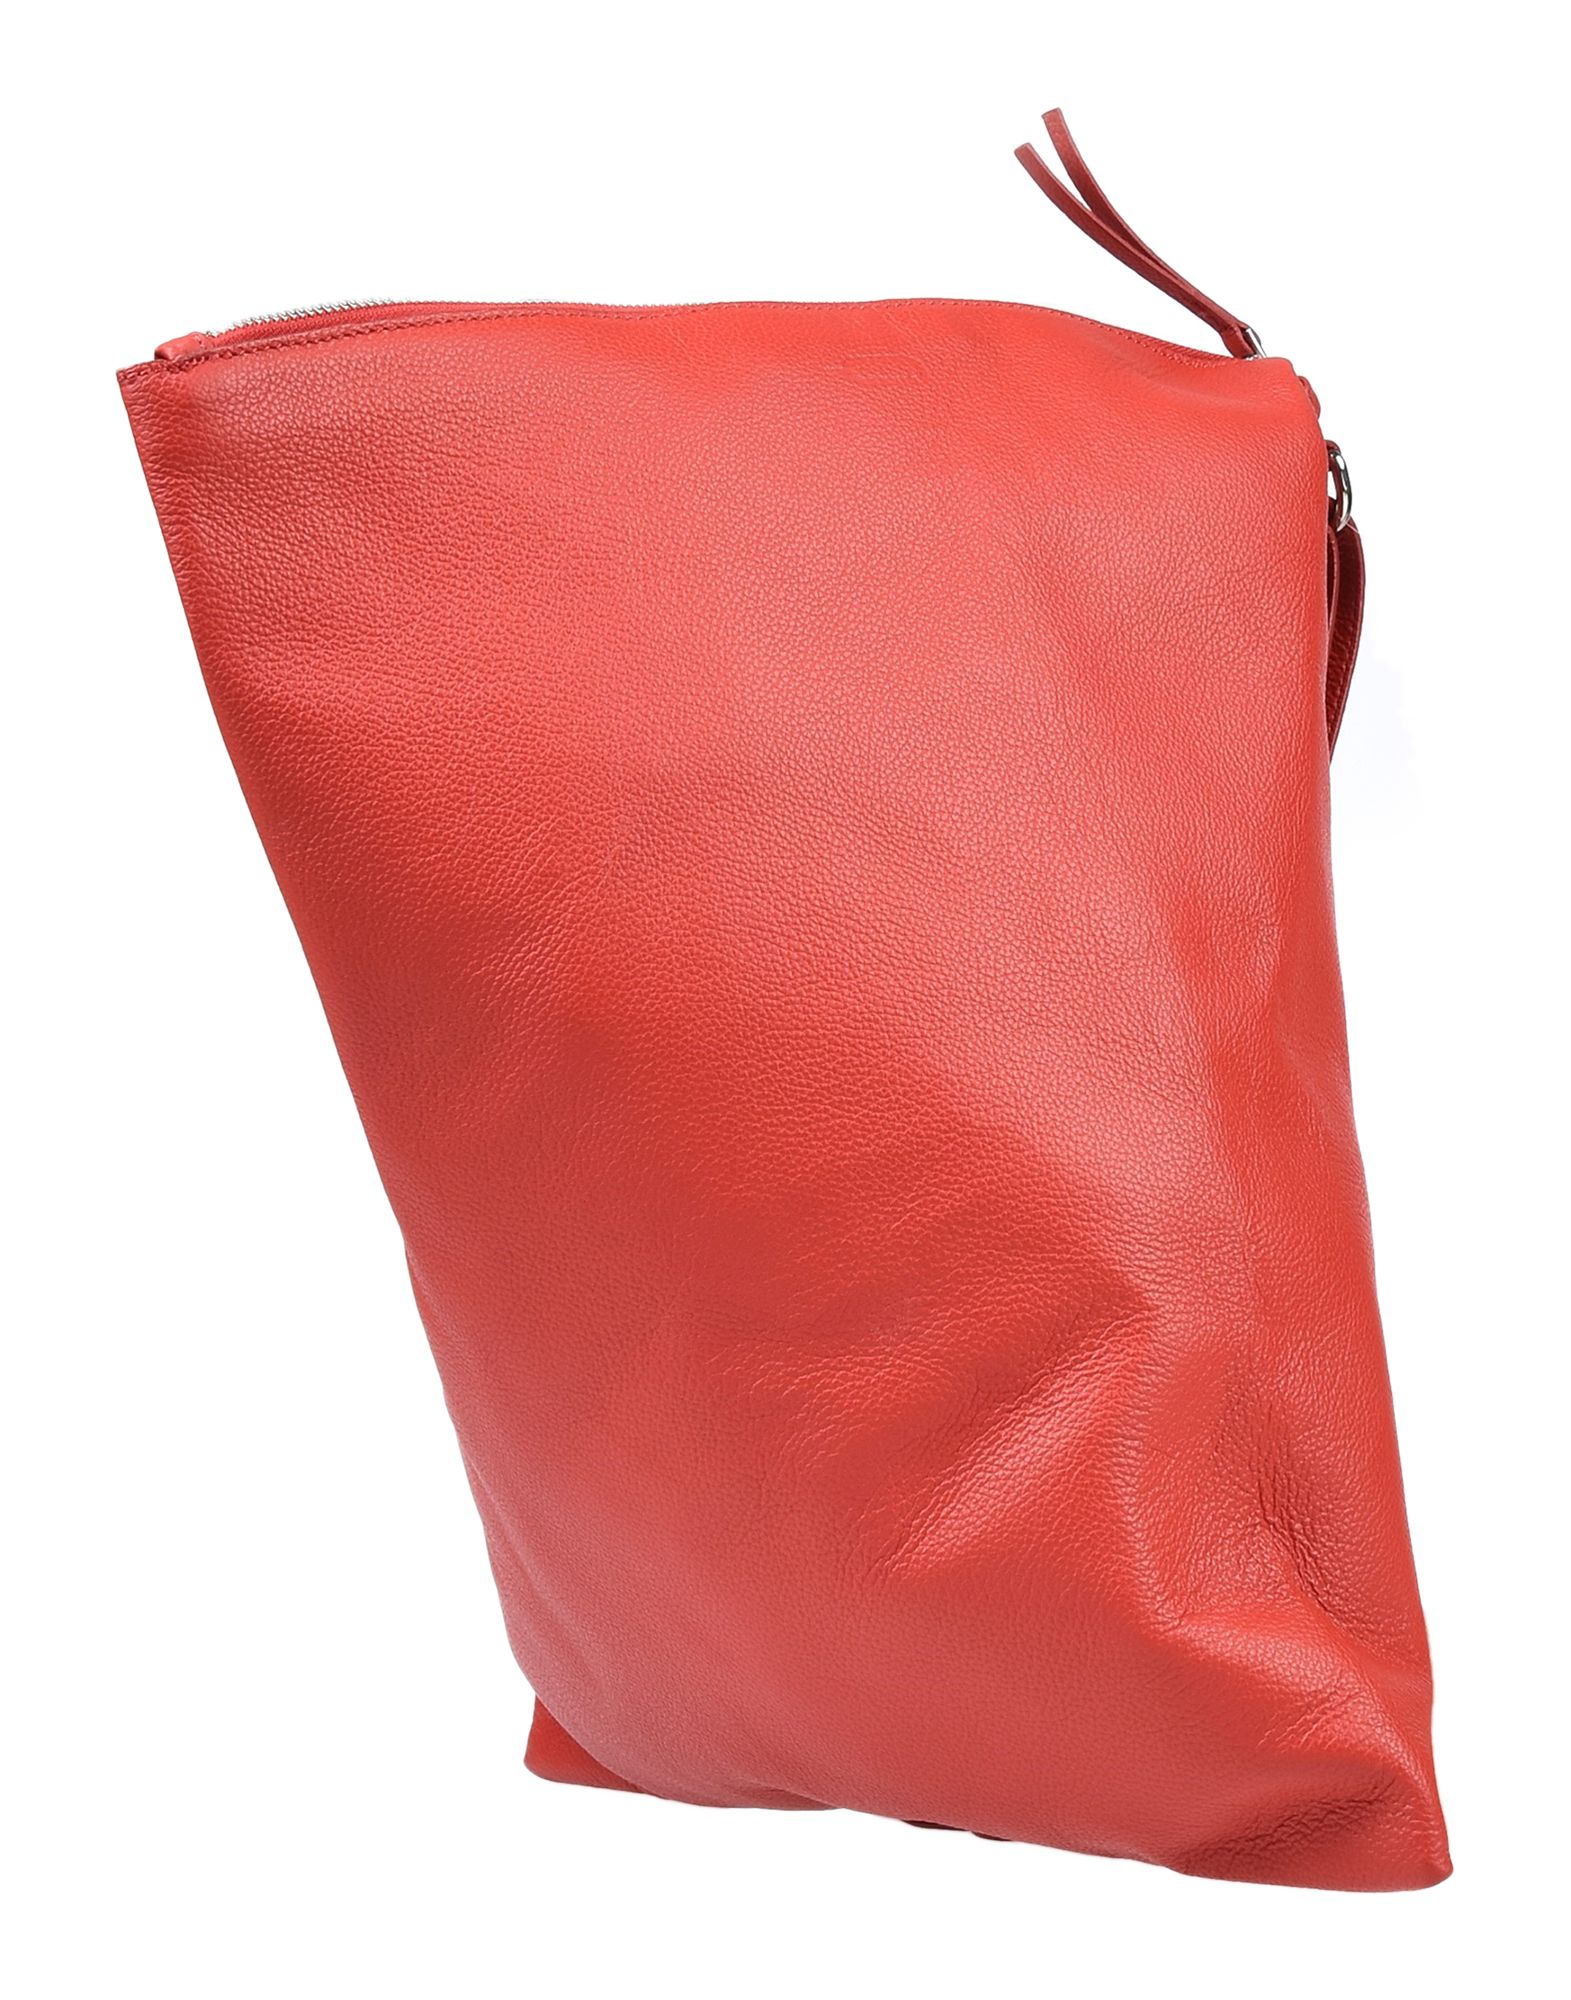 QUARZOVIVO Рюкзаки и сумки на пояс сумки magnolia сумка женская a761 7363 лак искусственная кожа page 8